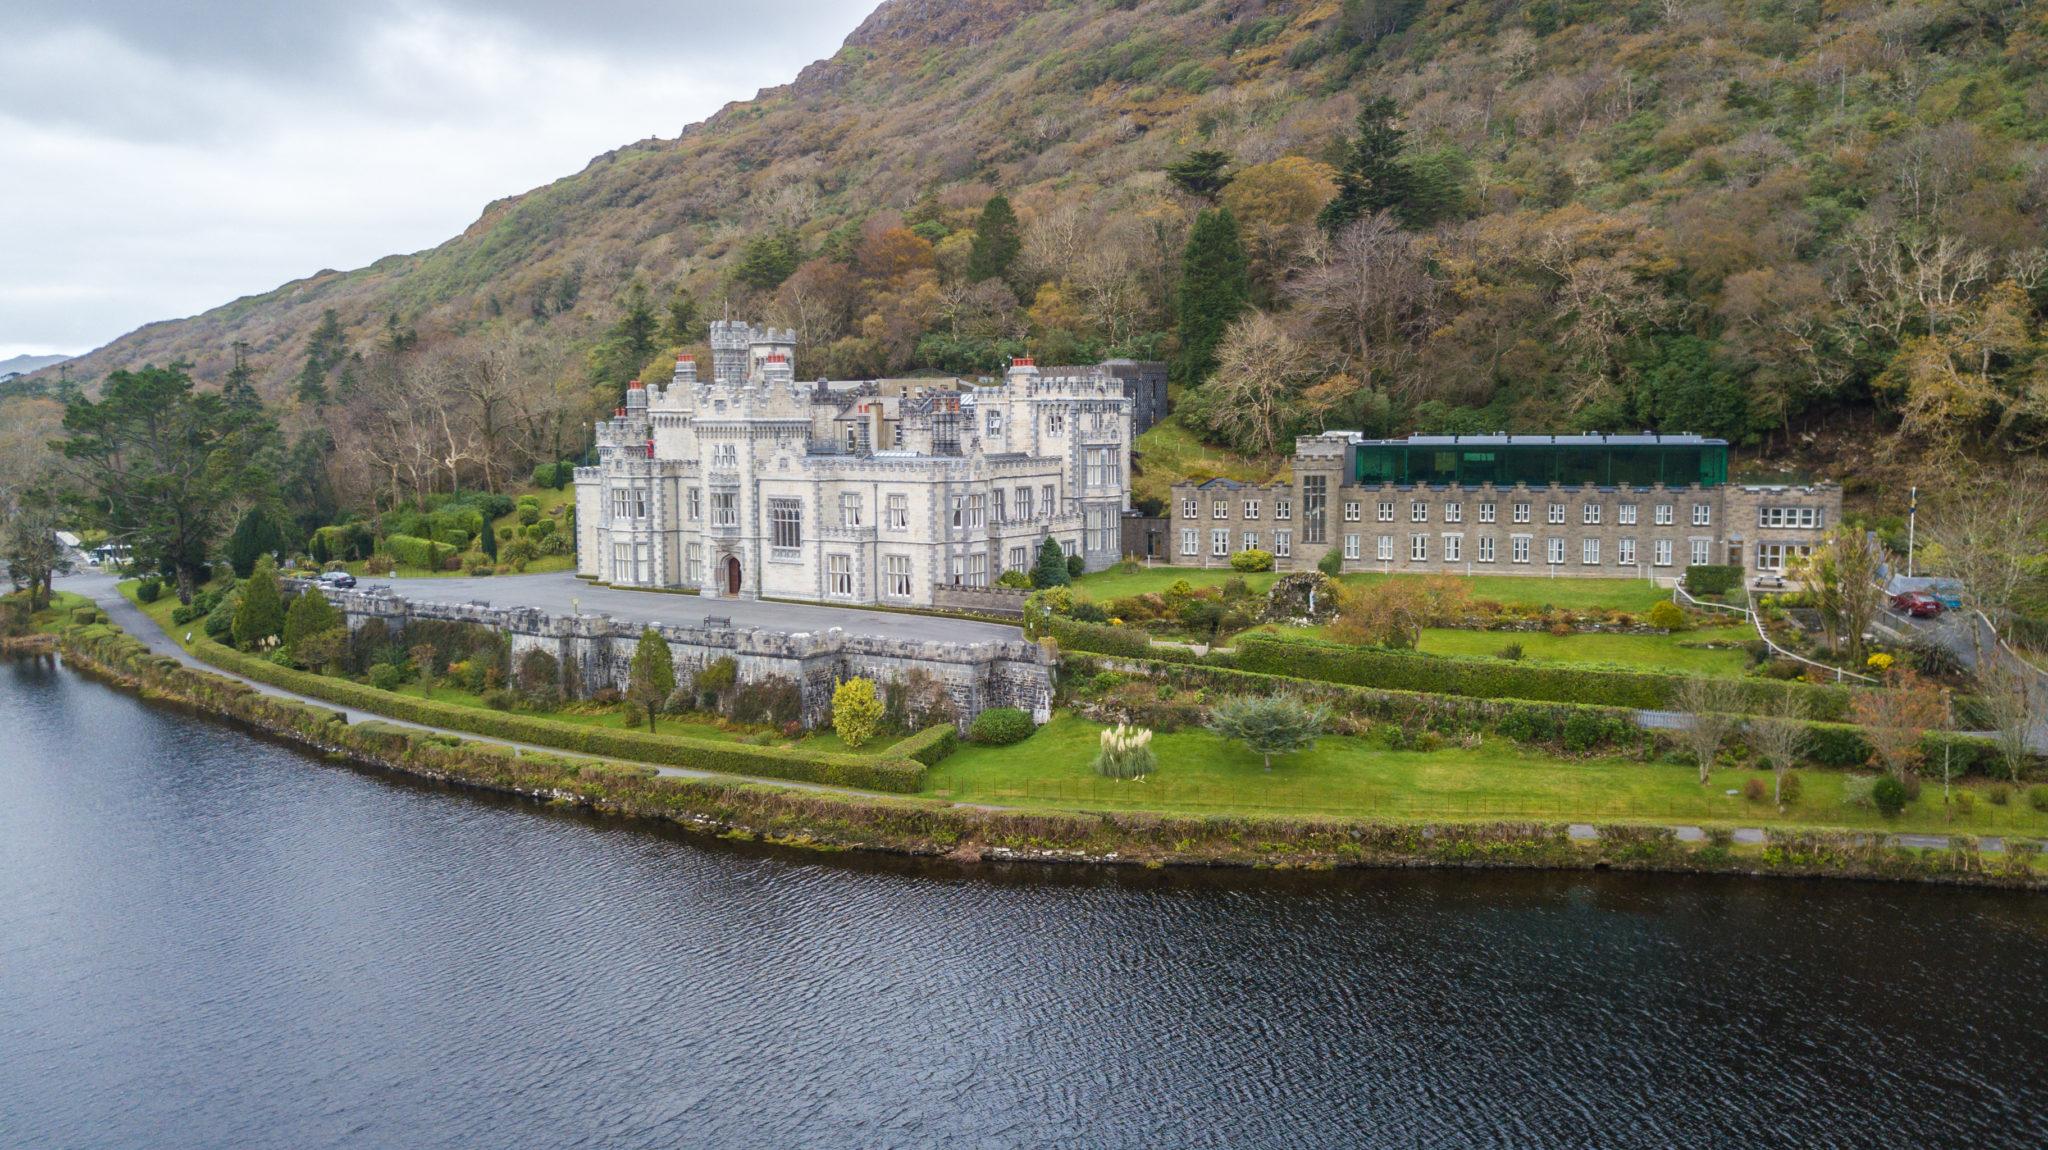 kylemore-abbaye-wild-atlantic-irlande-visite-voyage-chateau